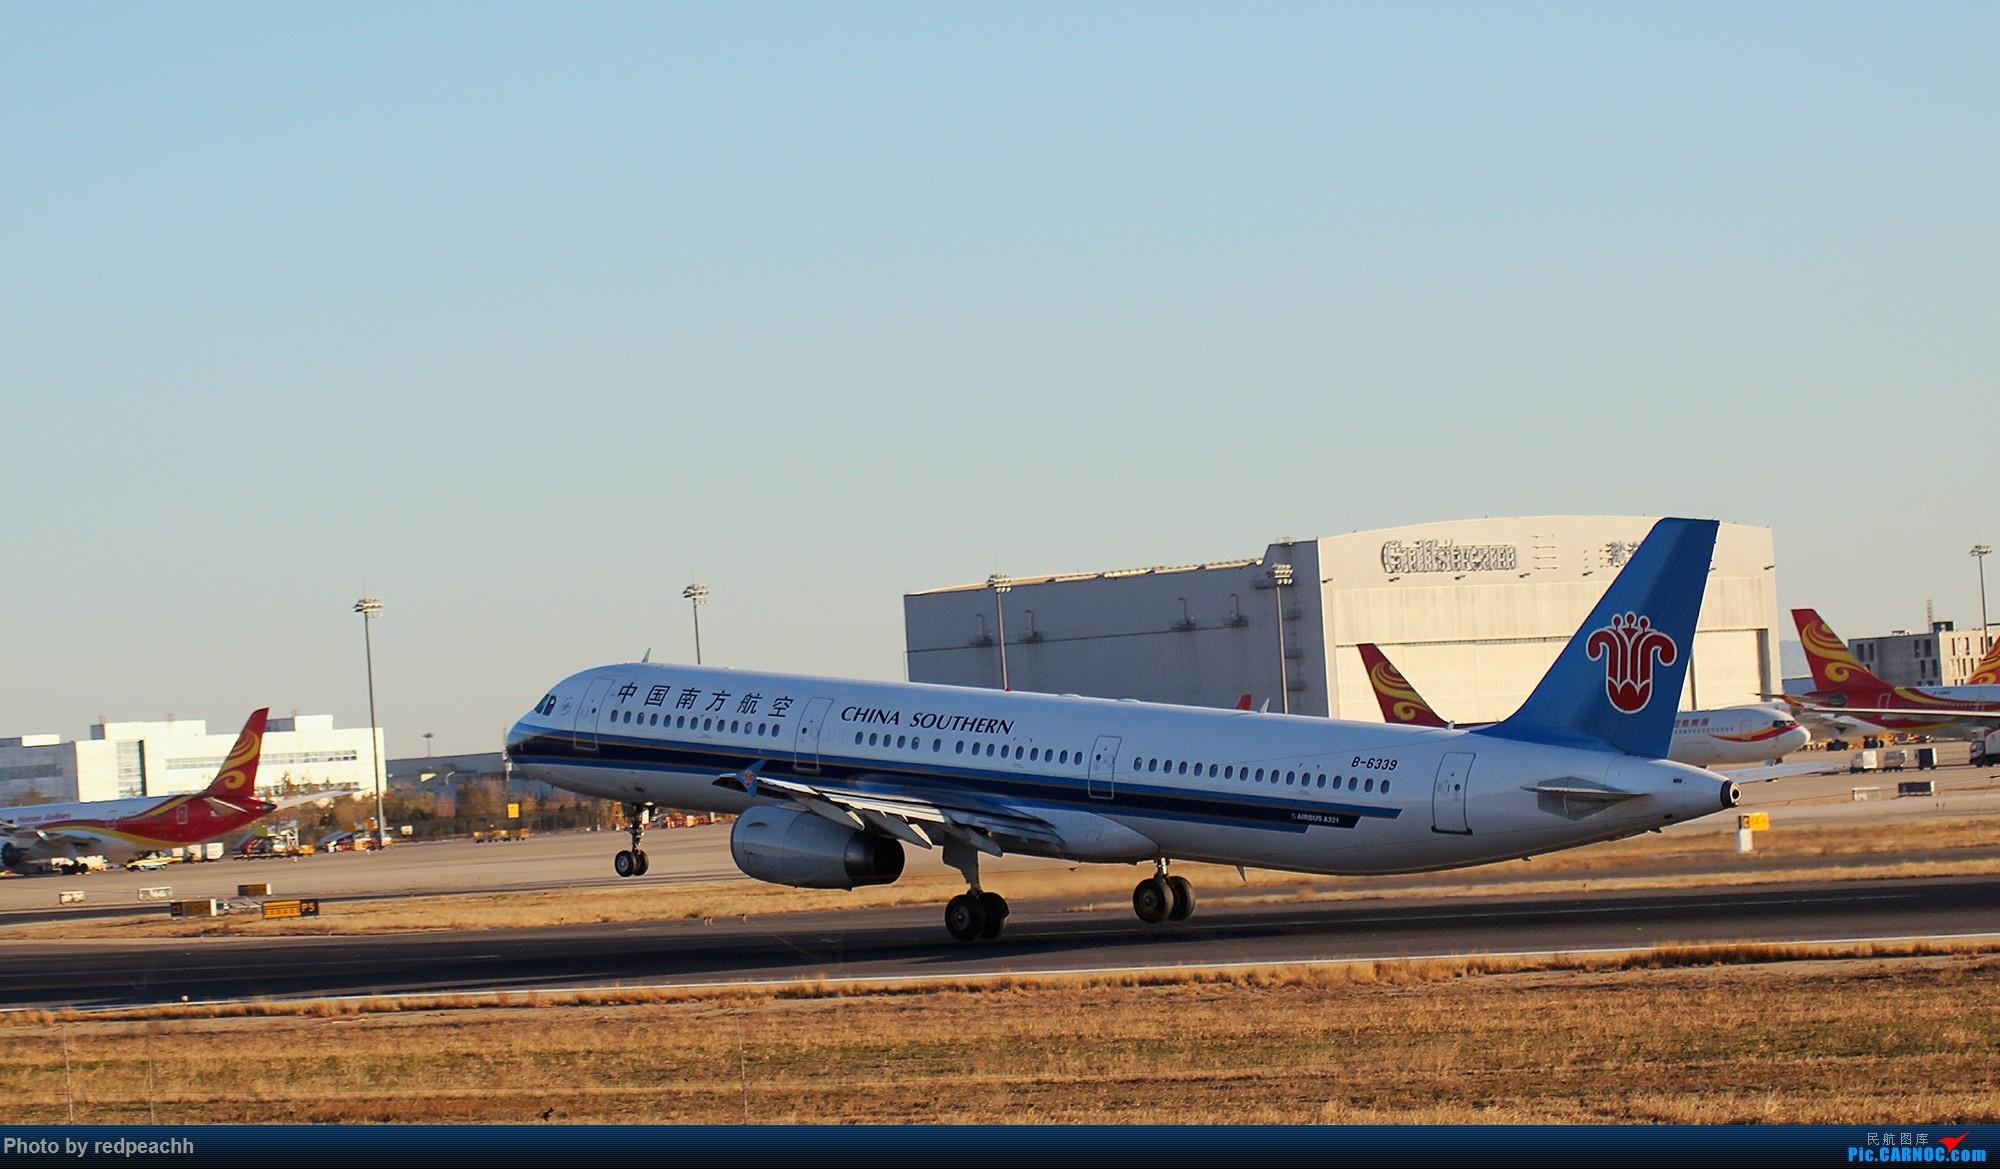 Re:[原创](持续更新)河北人为拍机而首都机场2日游(杨二营、八卦台)虽均为常规货但值得纪念(36L) AIRBUS A321-200 B-6339 中国北京首都国际机场